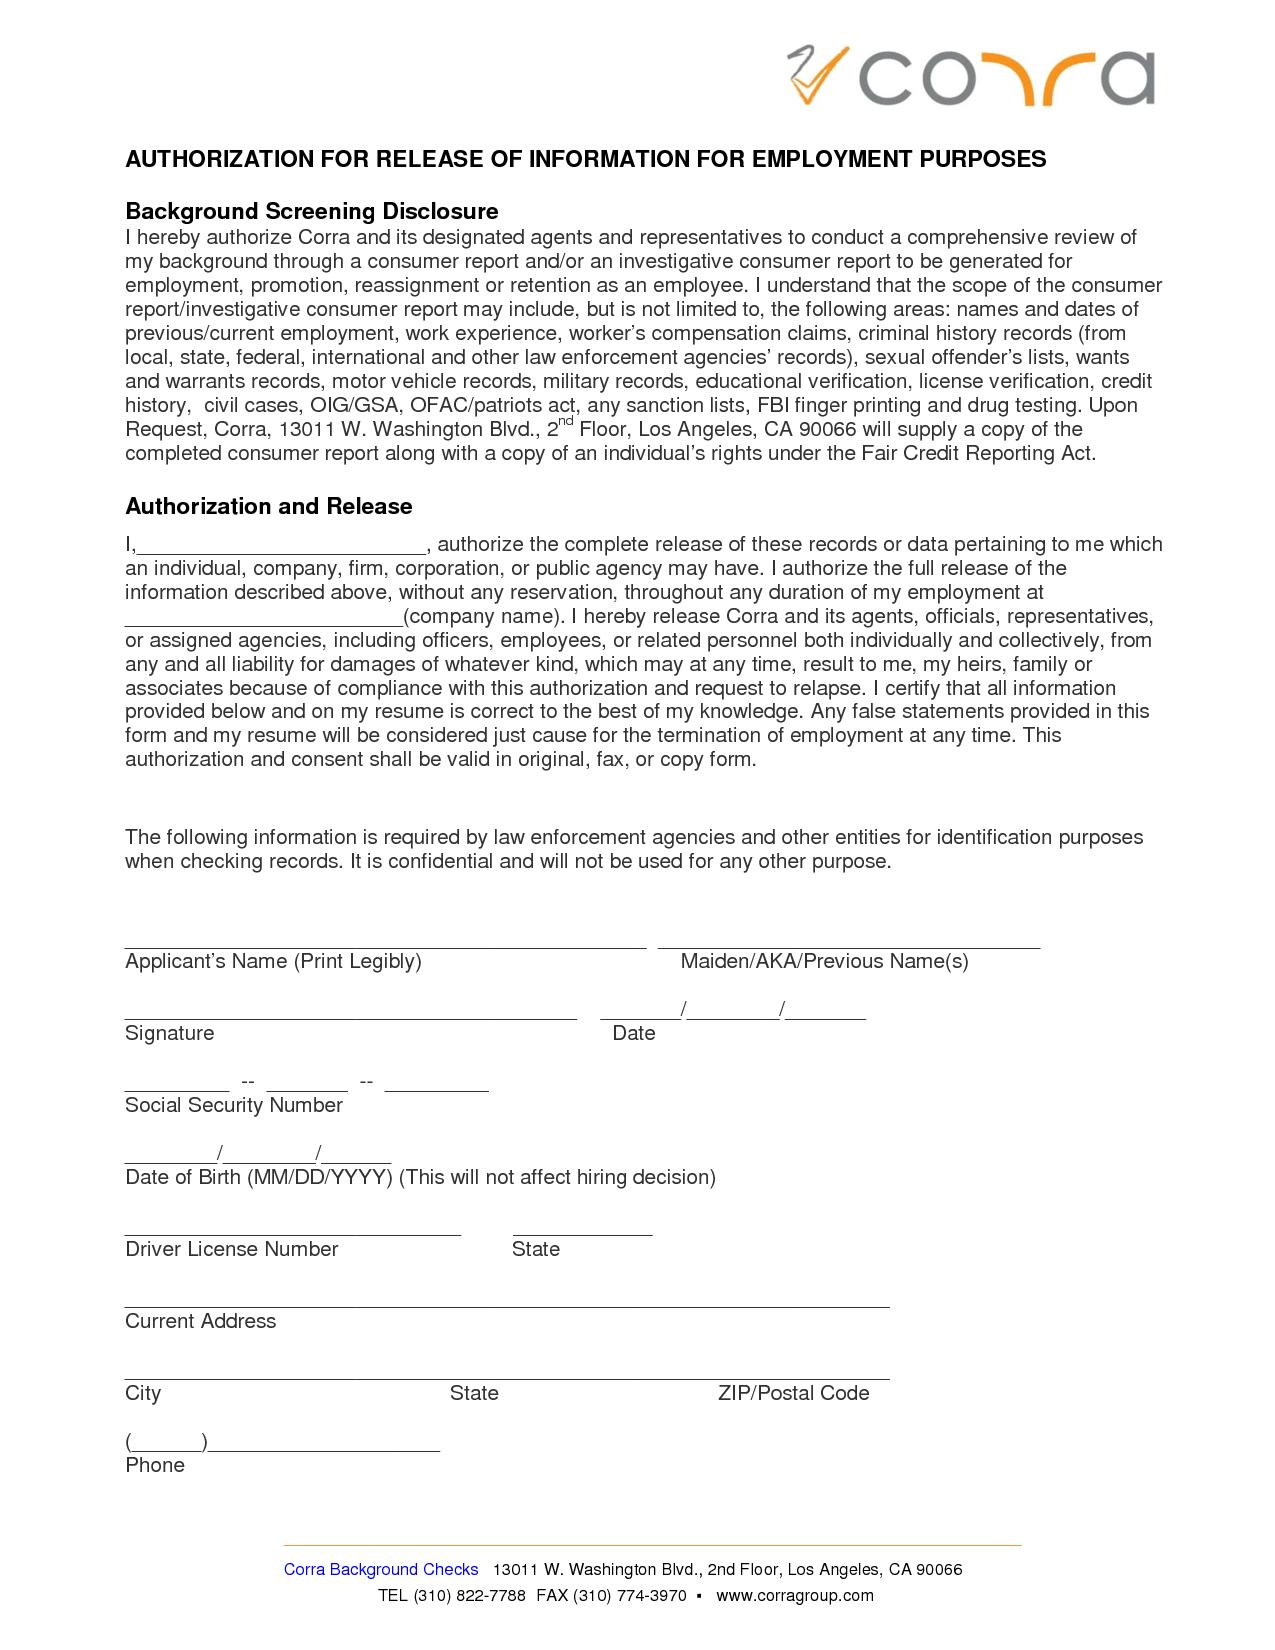 Employment Release Form  Corra Employment Screening Background